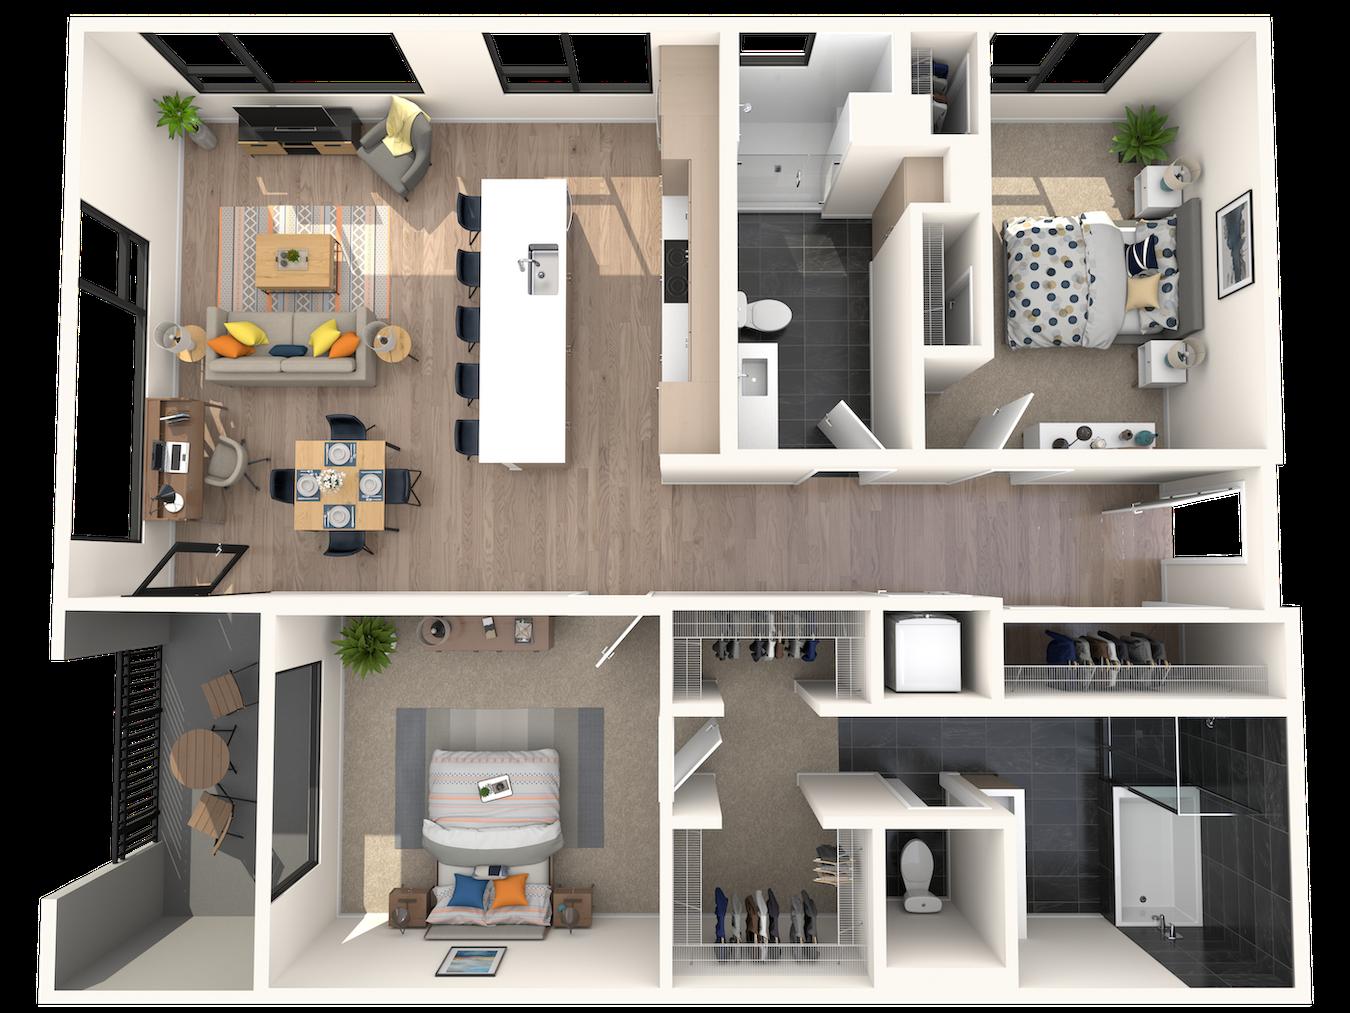 A2.1 Floor Plan